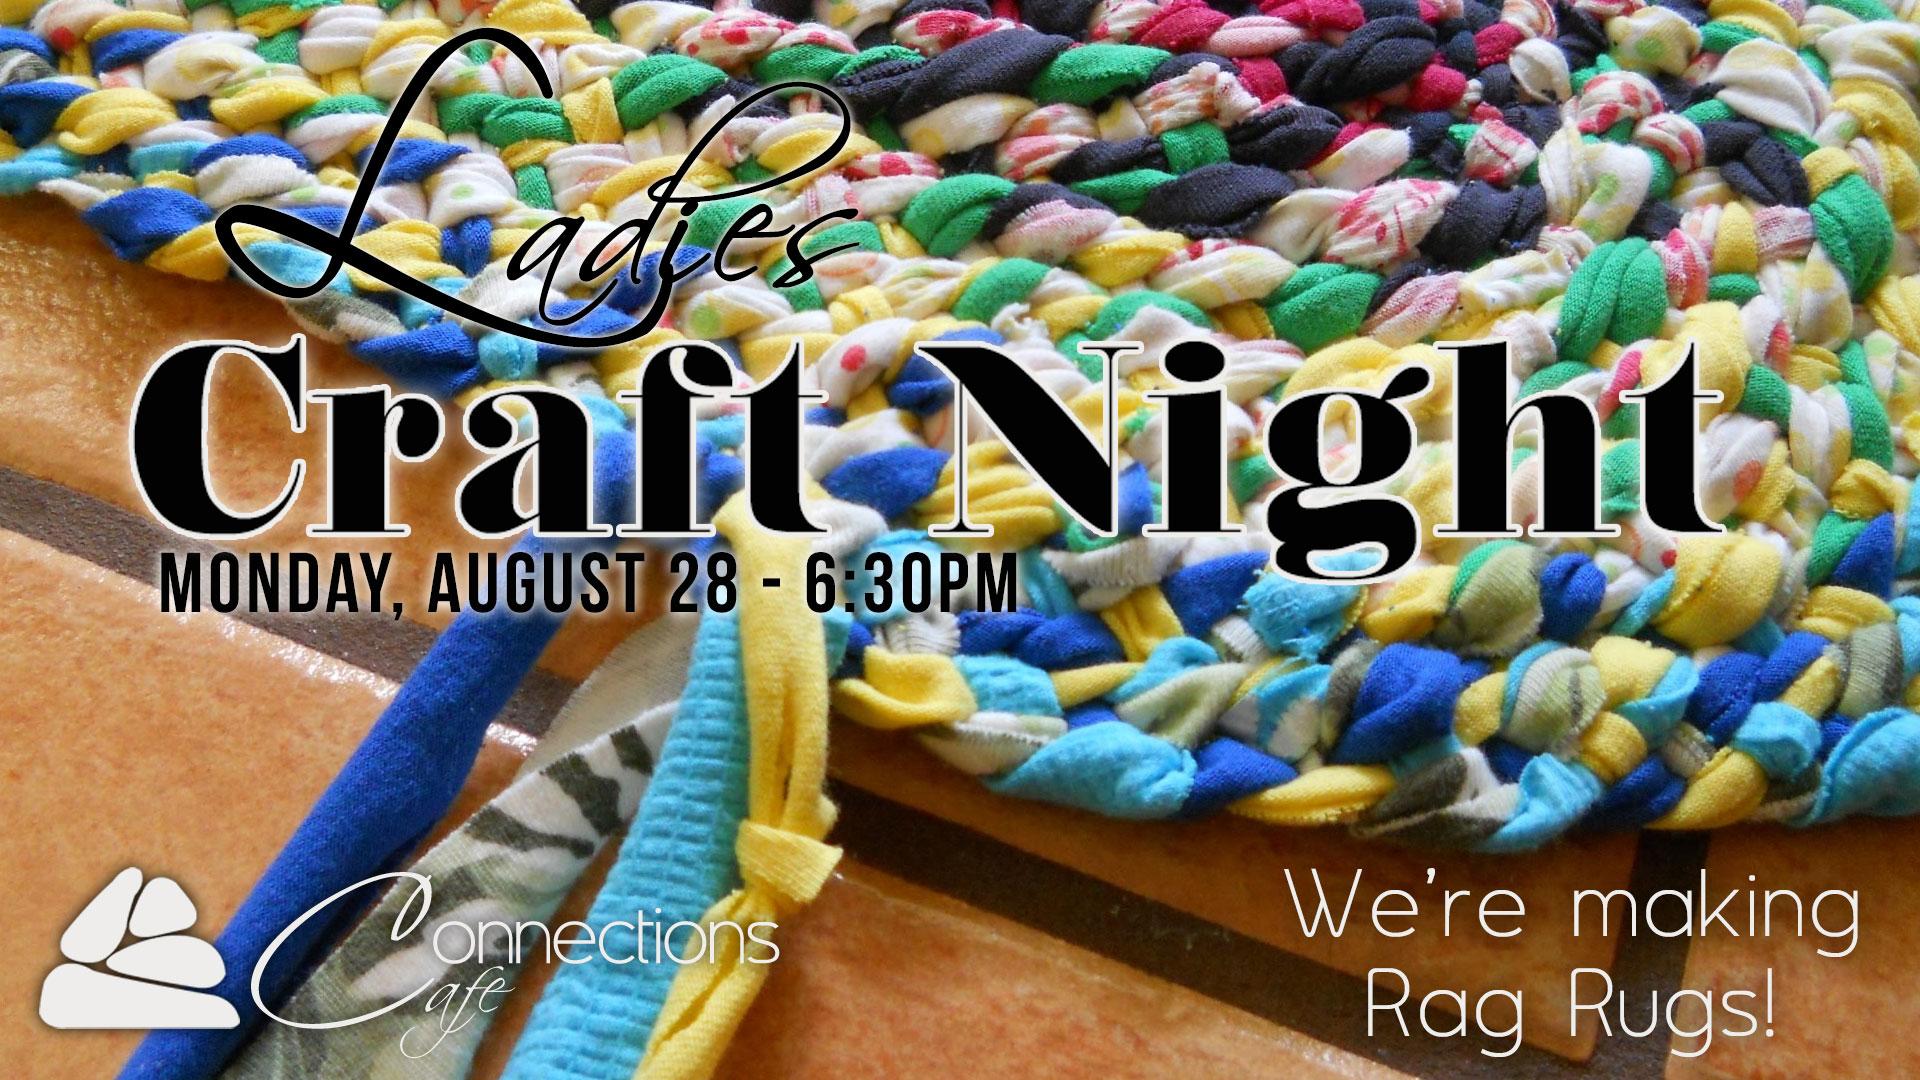 Craft night rag rugs